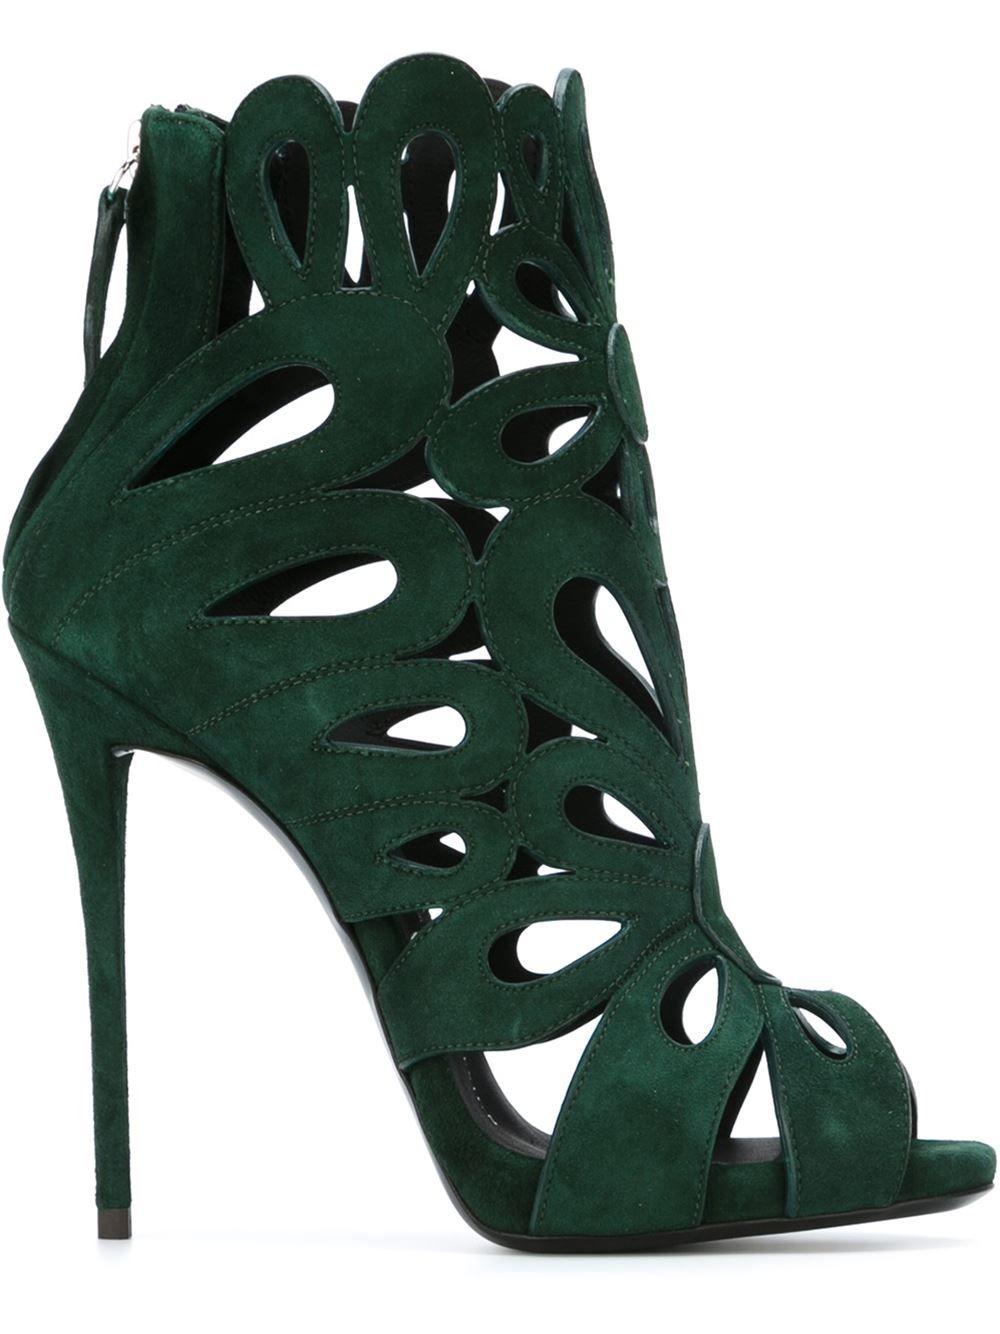 9bd48167bad Giuseppe Zanotti Design Rear Zip Sandals - Satù - Farfetch.com